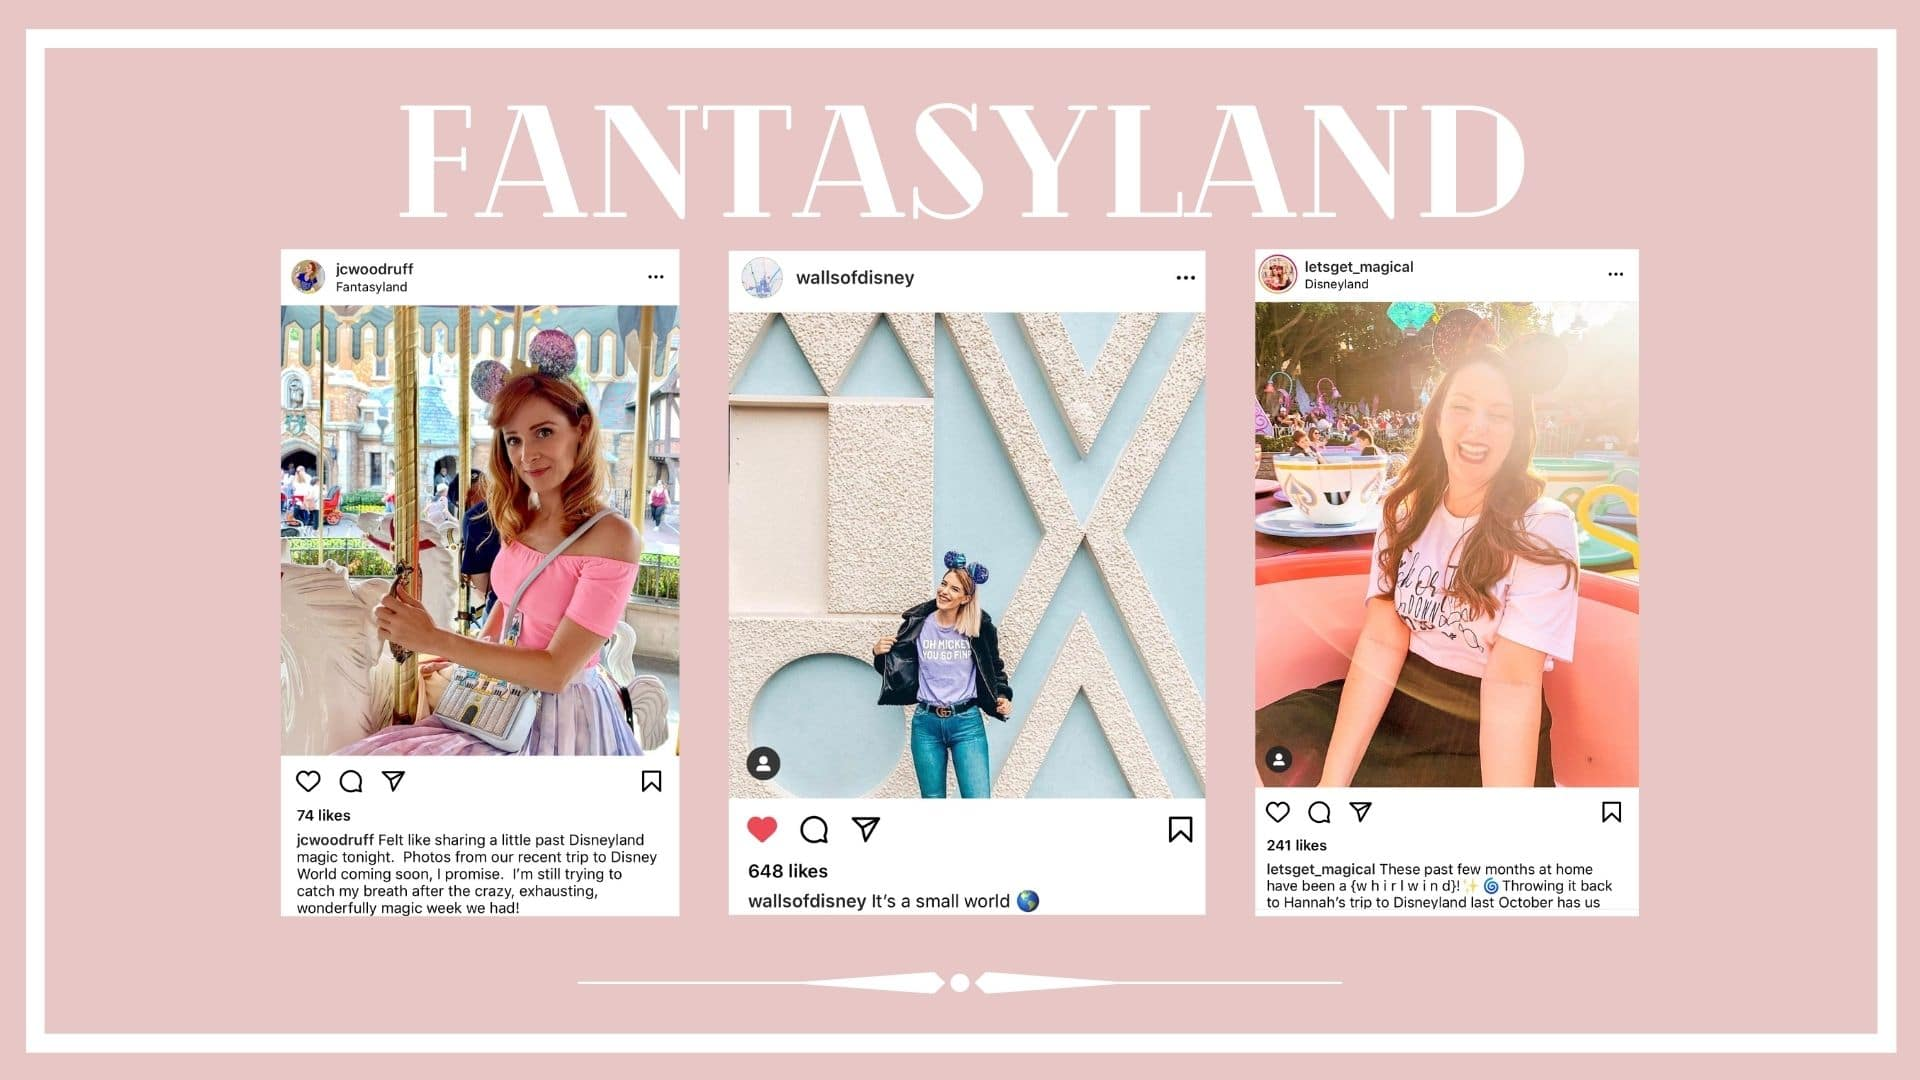 Instagram posts about Fantasyland at Disney